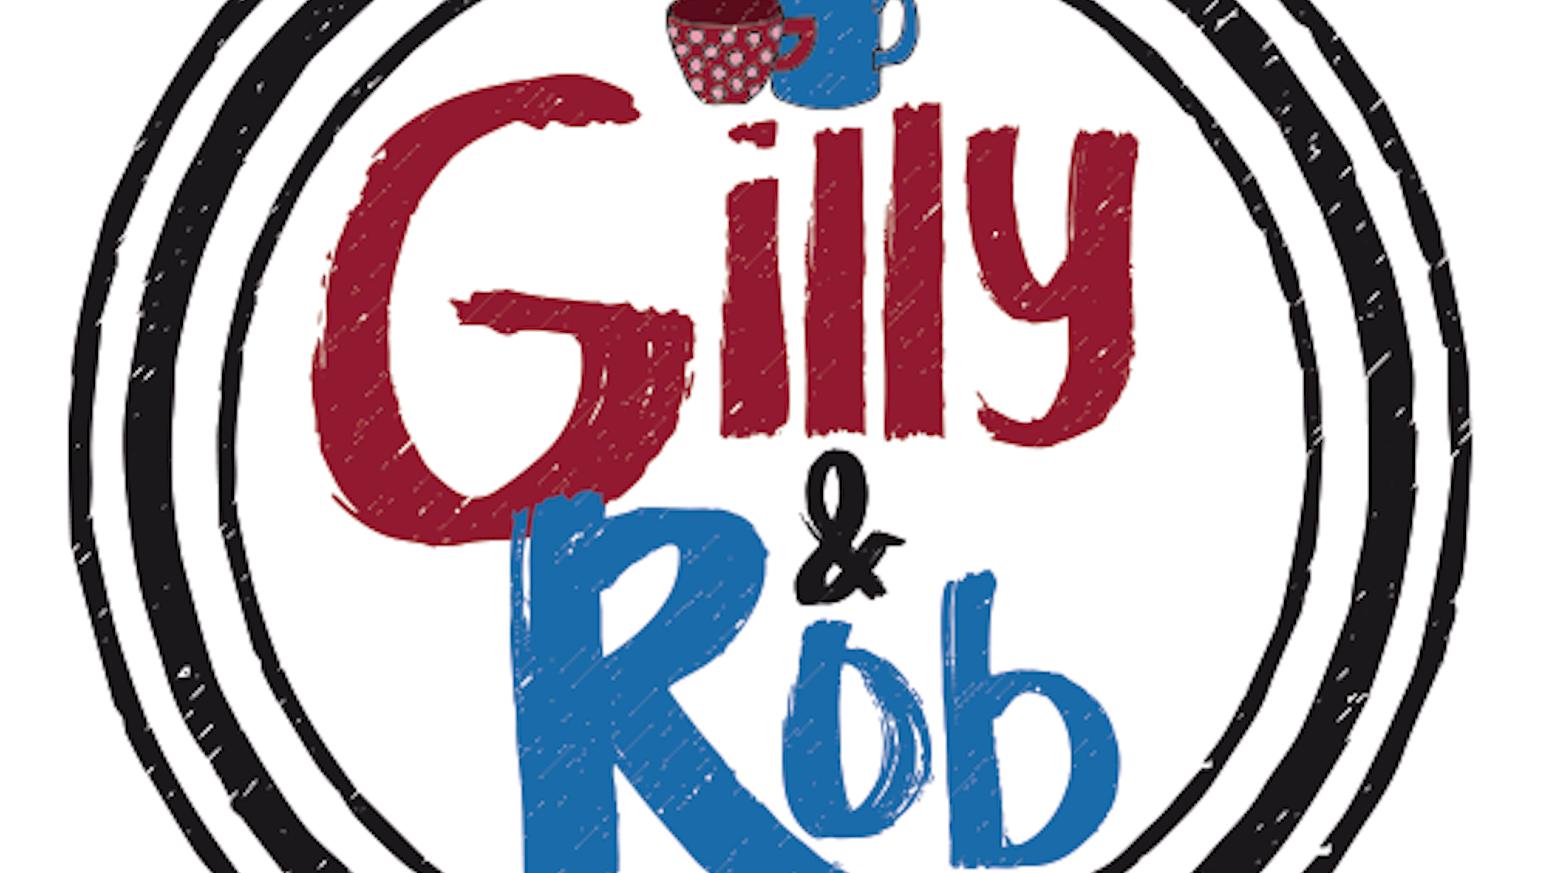 Gilly Rob Greeting Cards By Gillian Duggan White Kickstarter